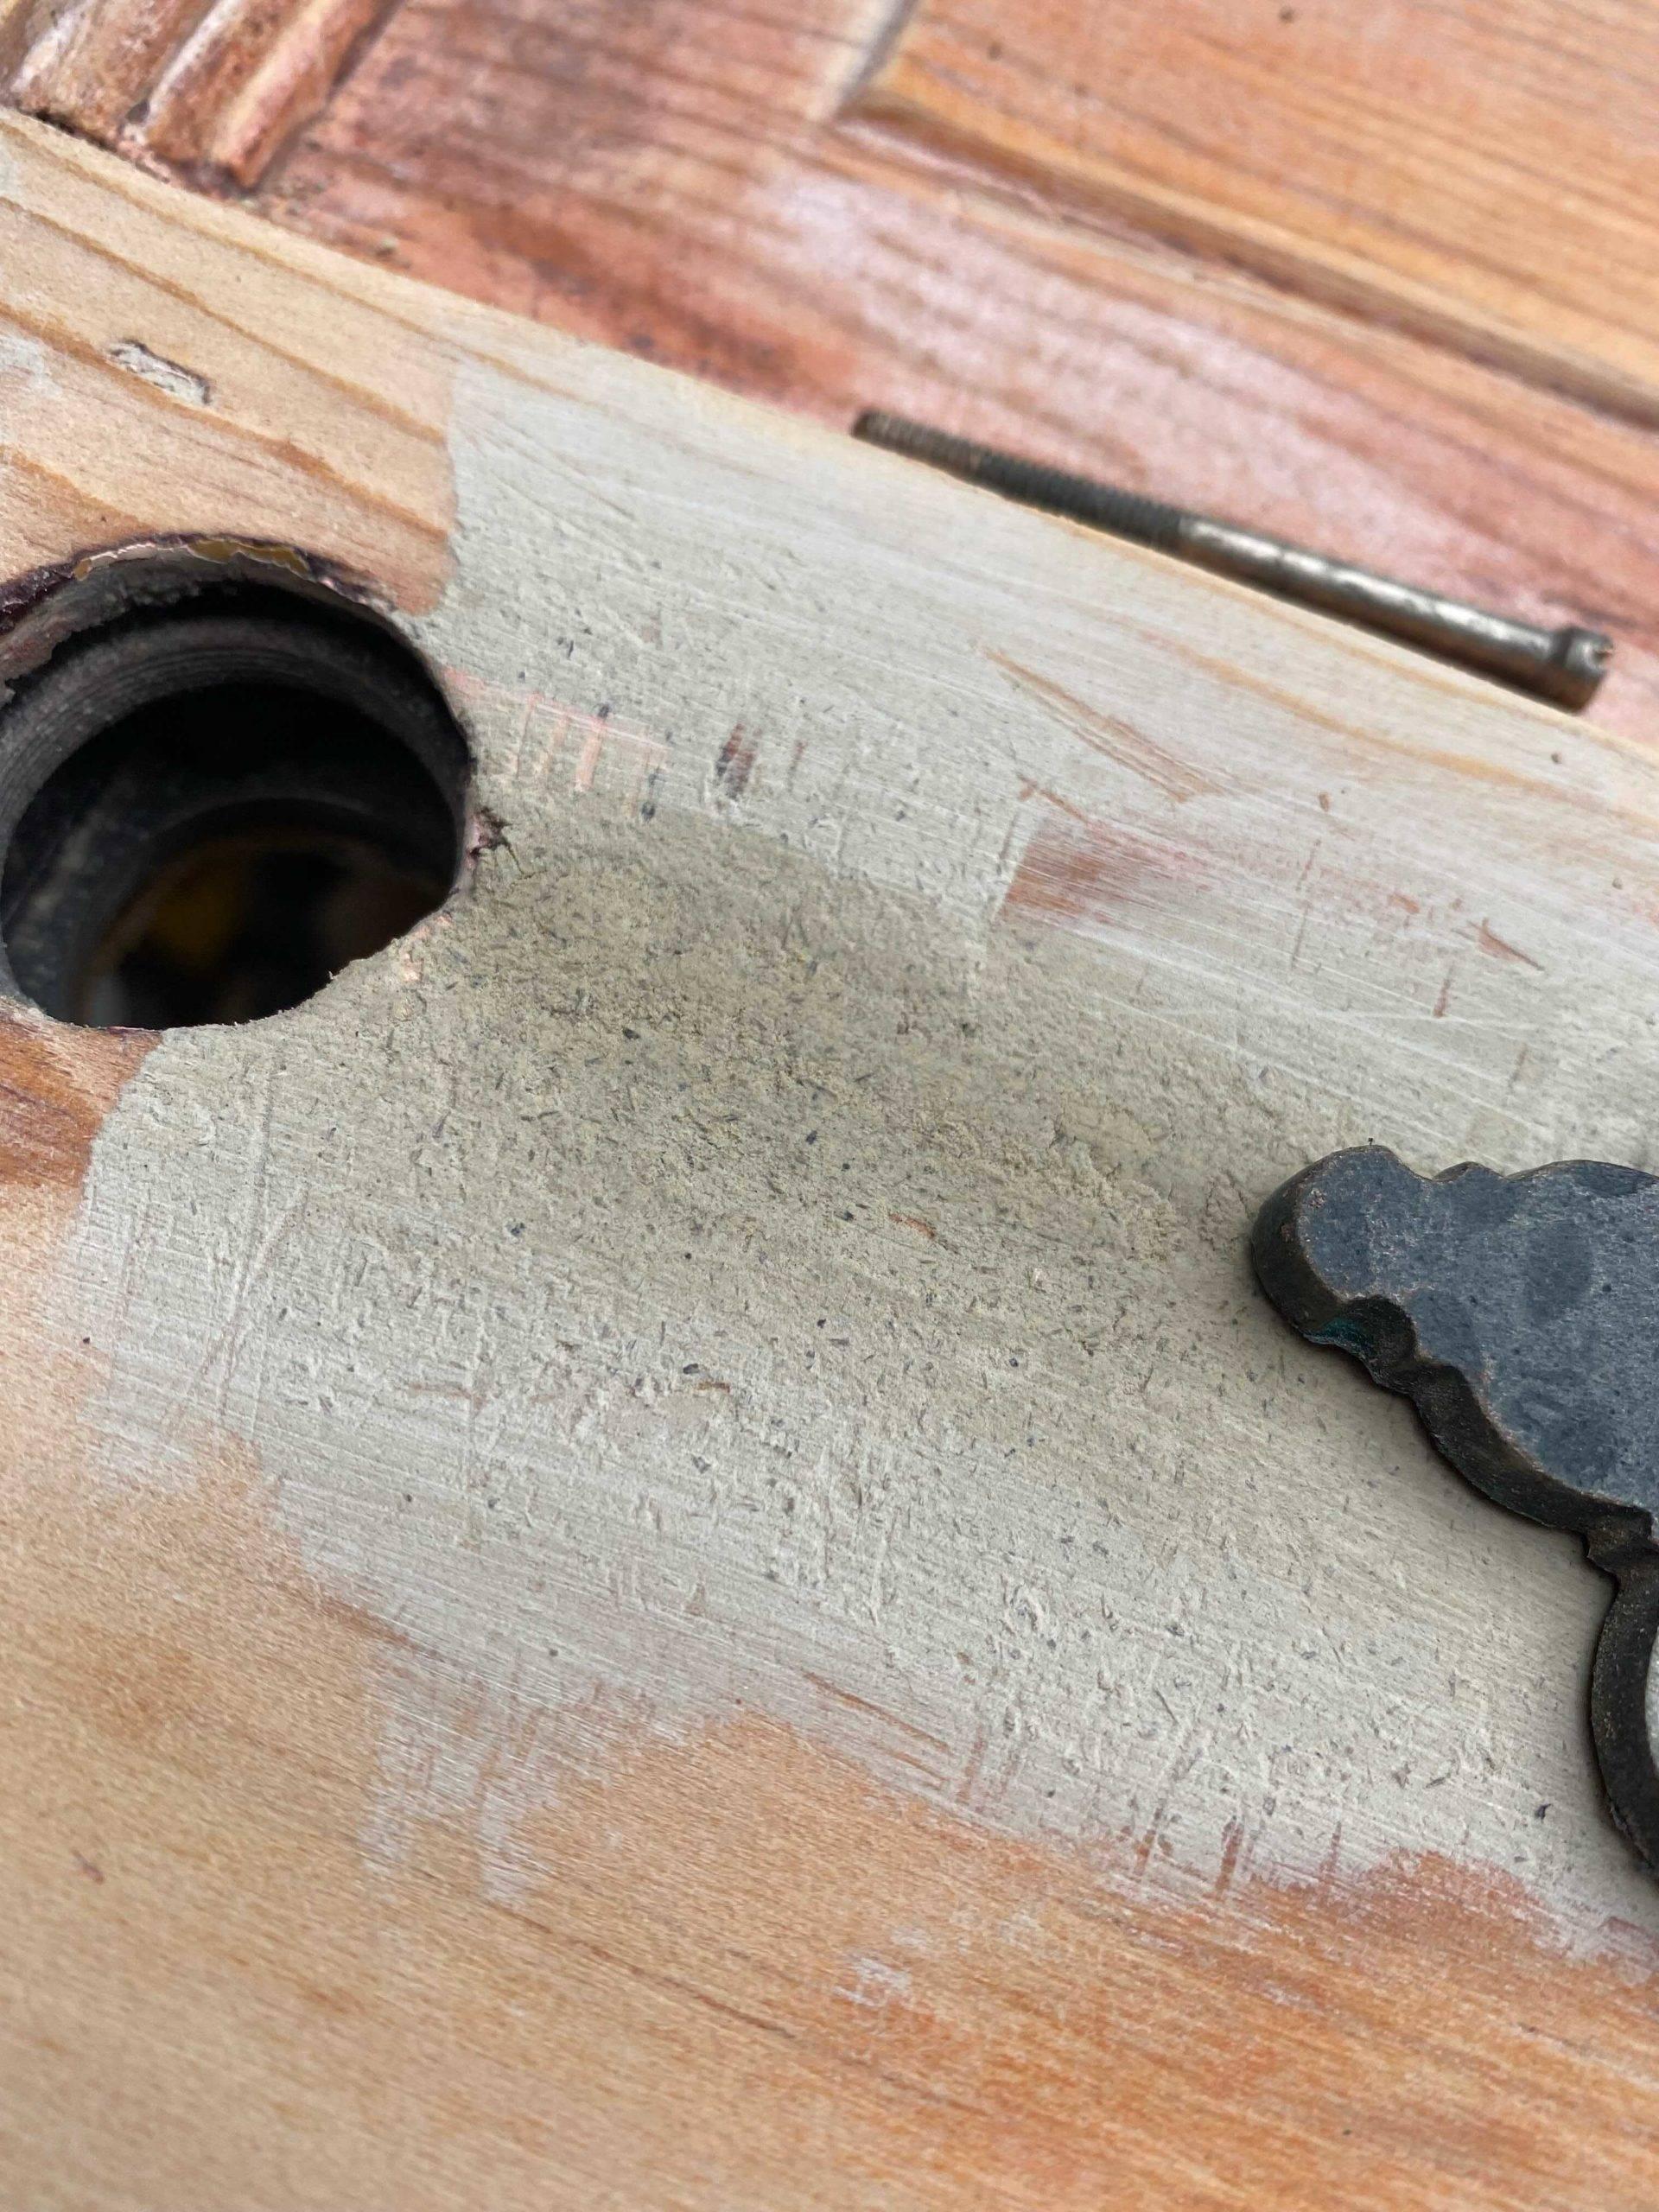 sanded down section of door